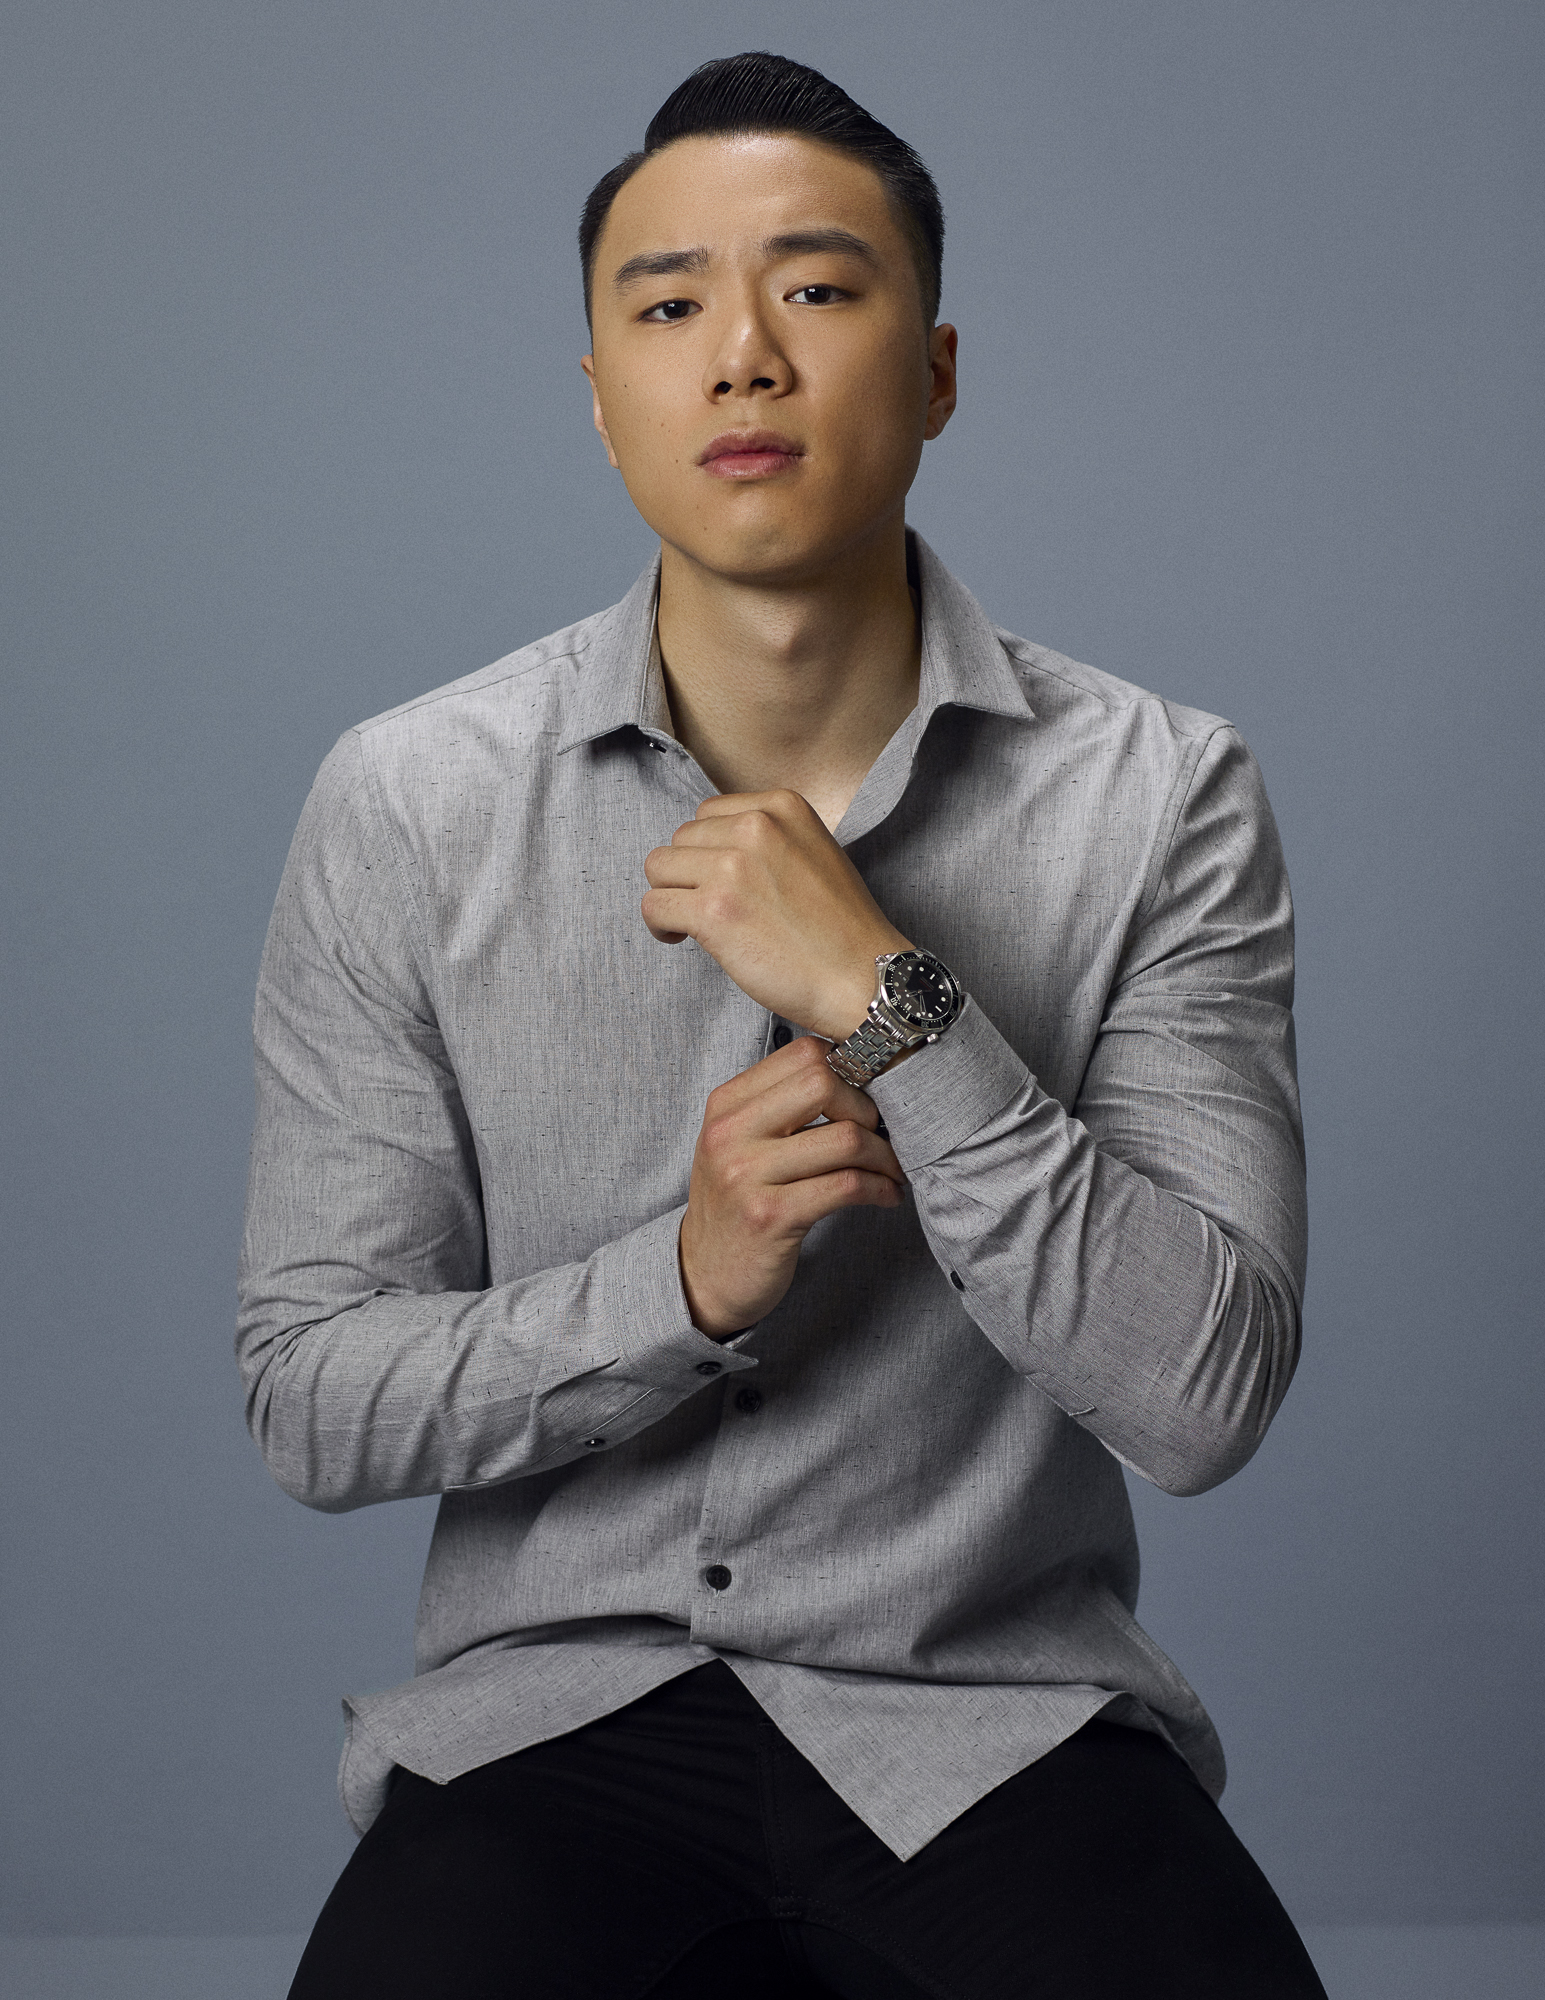 corporate business headshots portrait acting professional photography photographer toronto studio